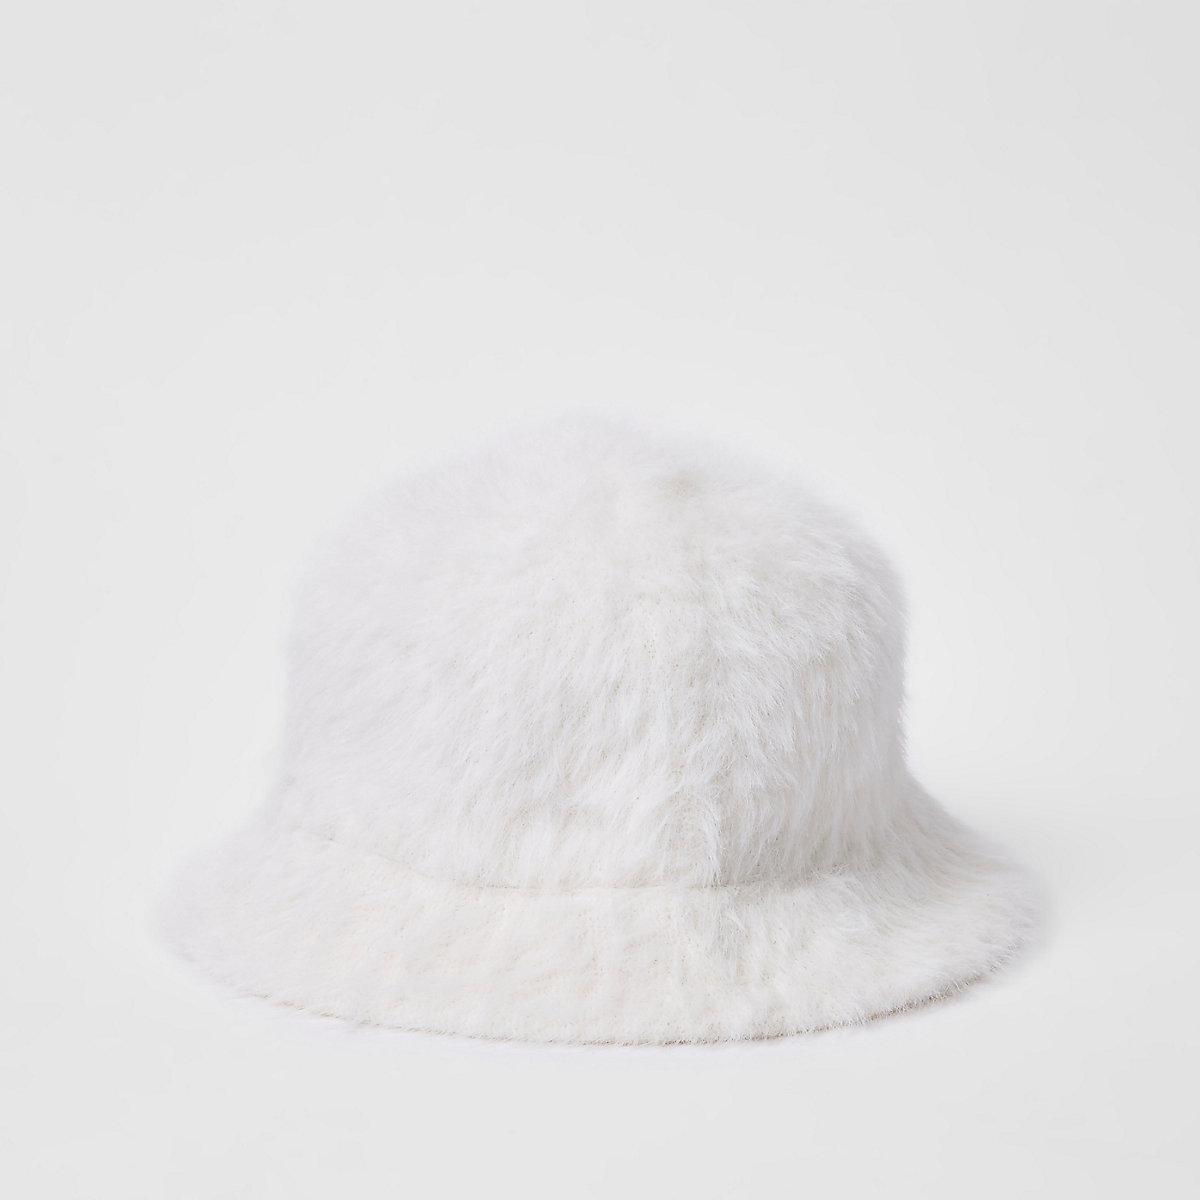 White fluffy bucket hat - Hats - Accessories - women b551bda6a35